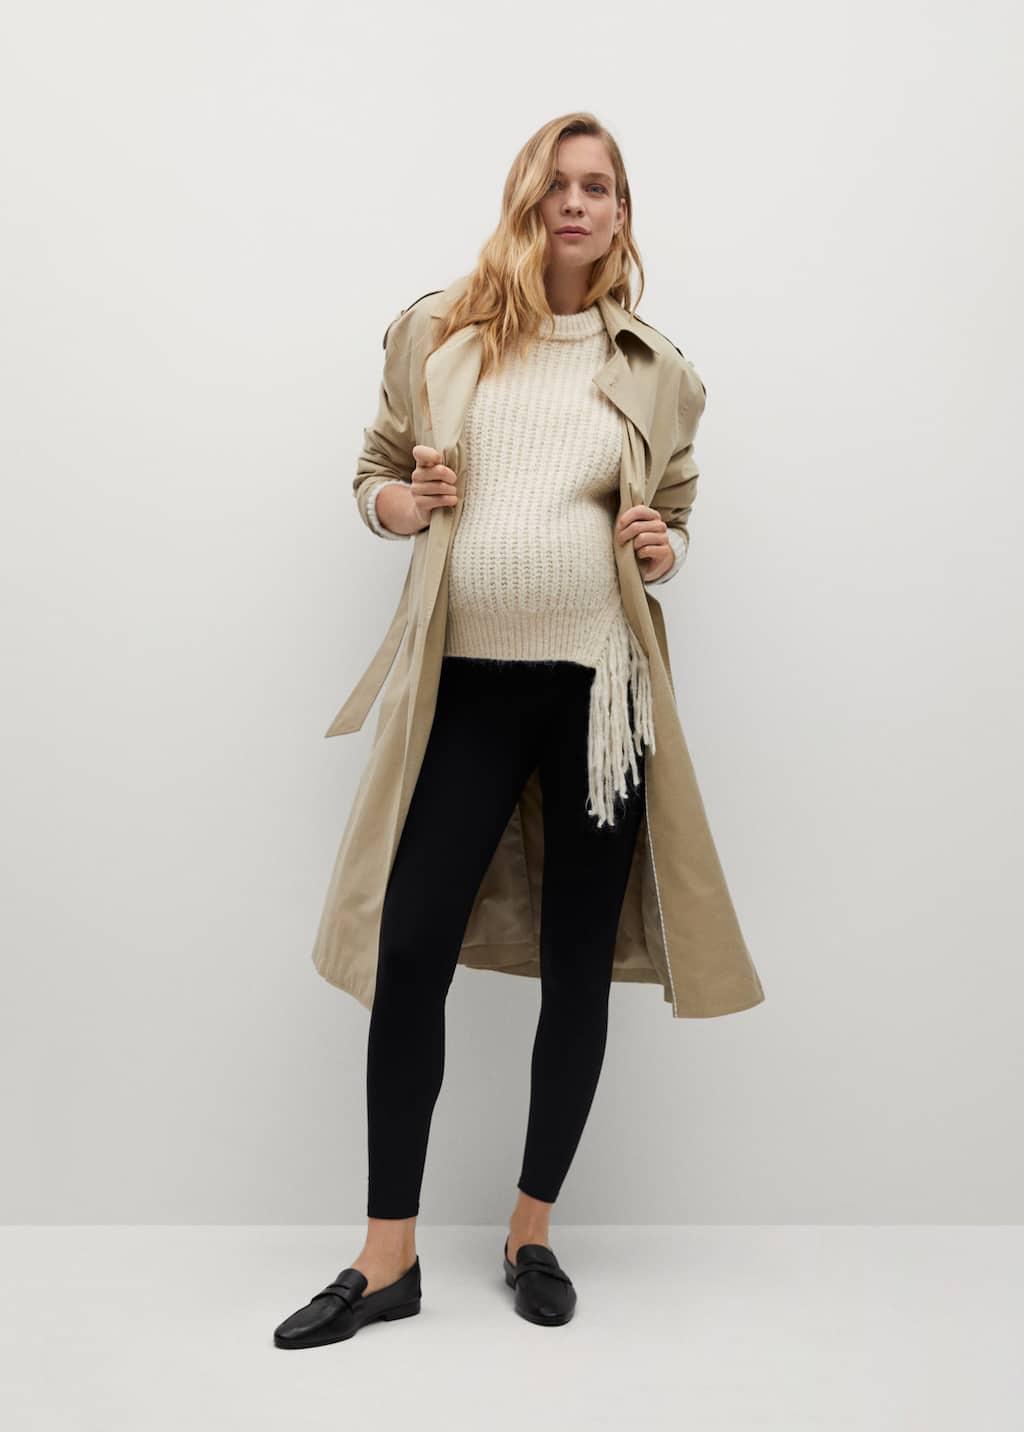 Legging coton Maternity - Plan général